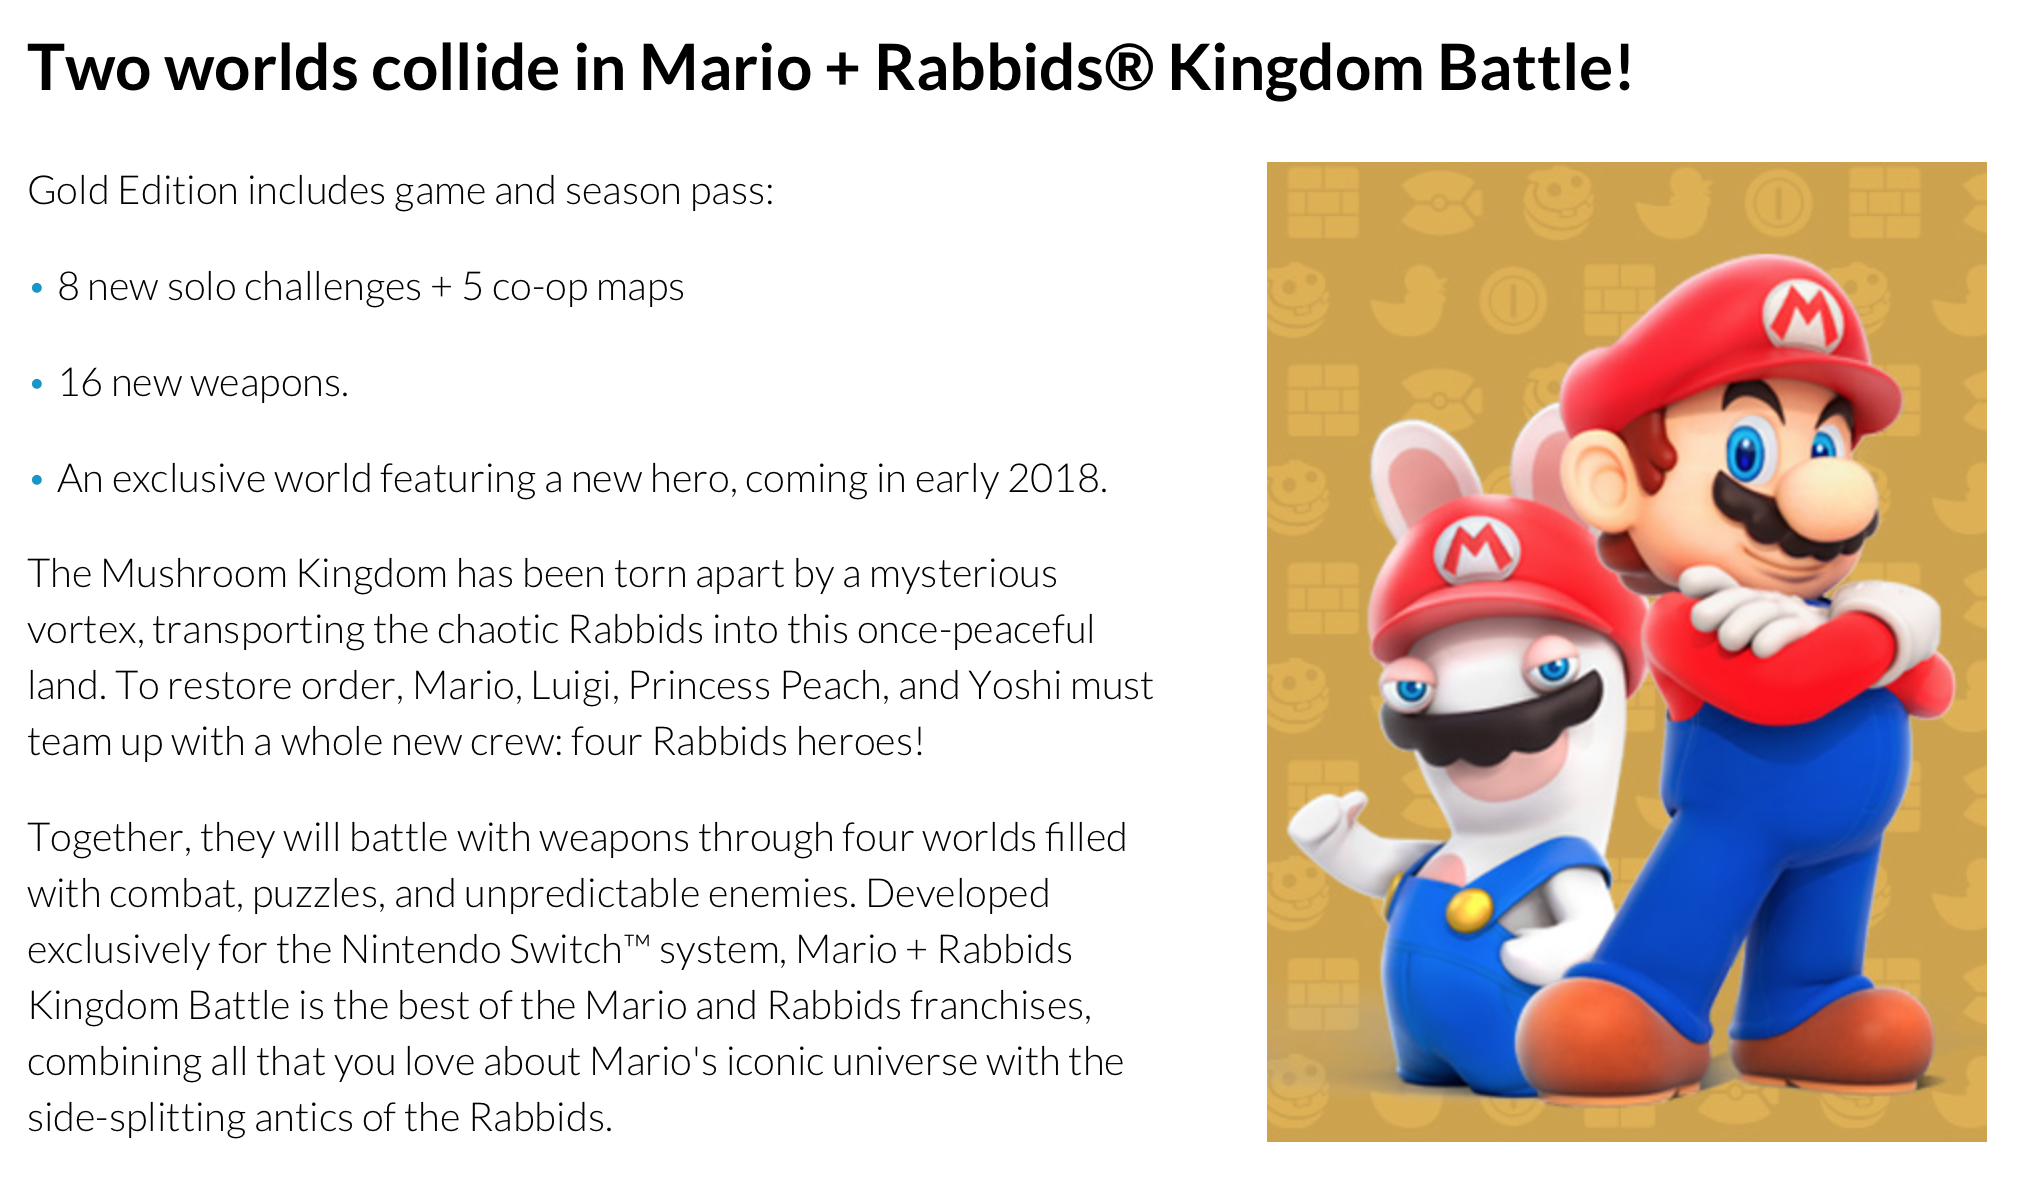 Mario + Rabbids: Kingdom Battle DLC Details Leak - http://www.ign.com/articles/2017/11/20/mario-rabbids-kingdom-battle-dlc-details-leak